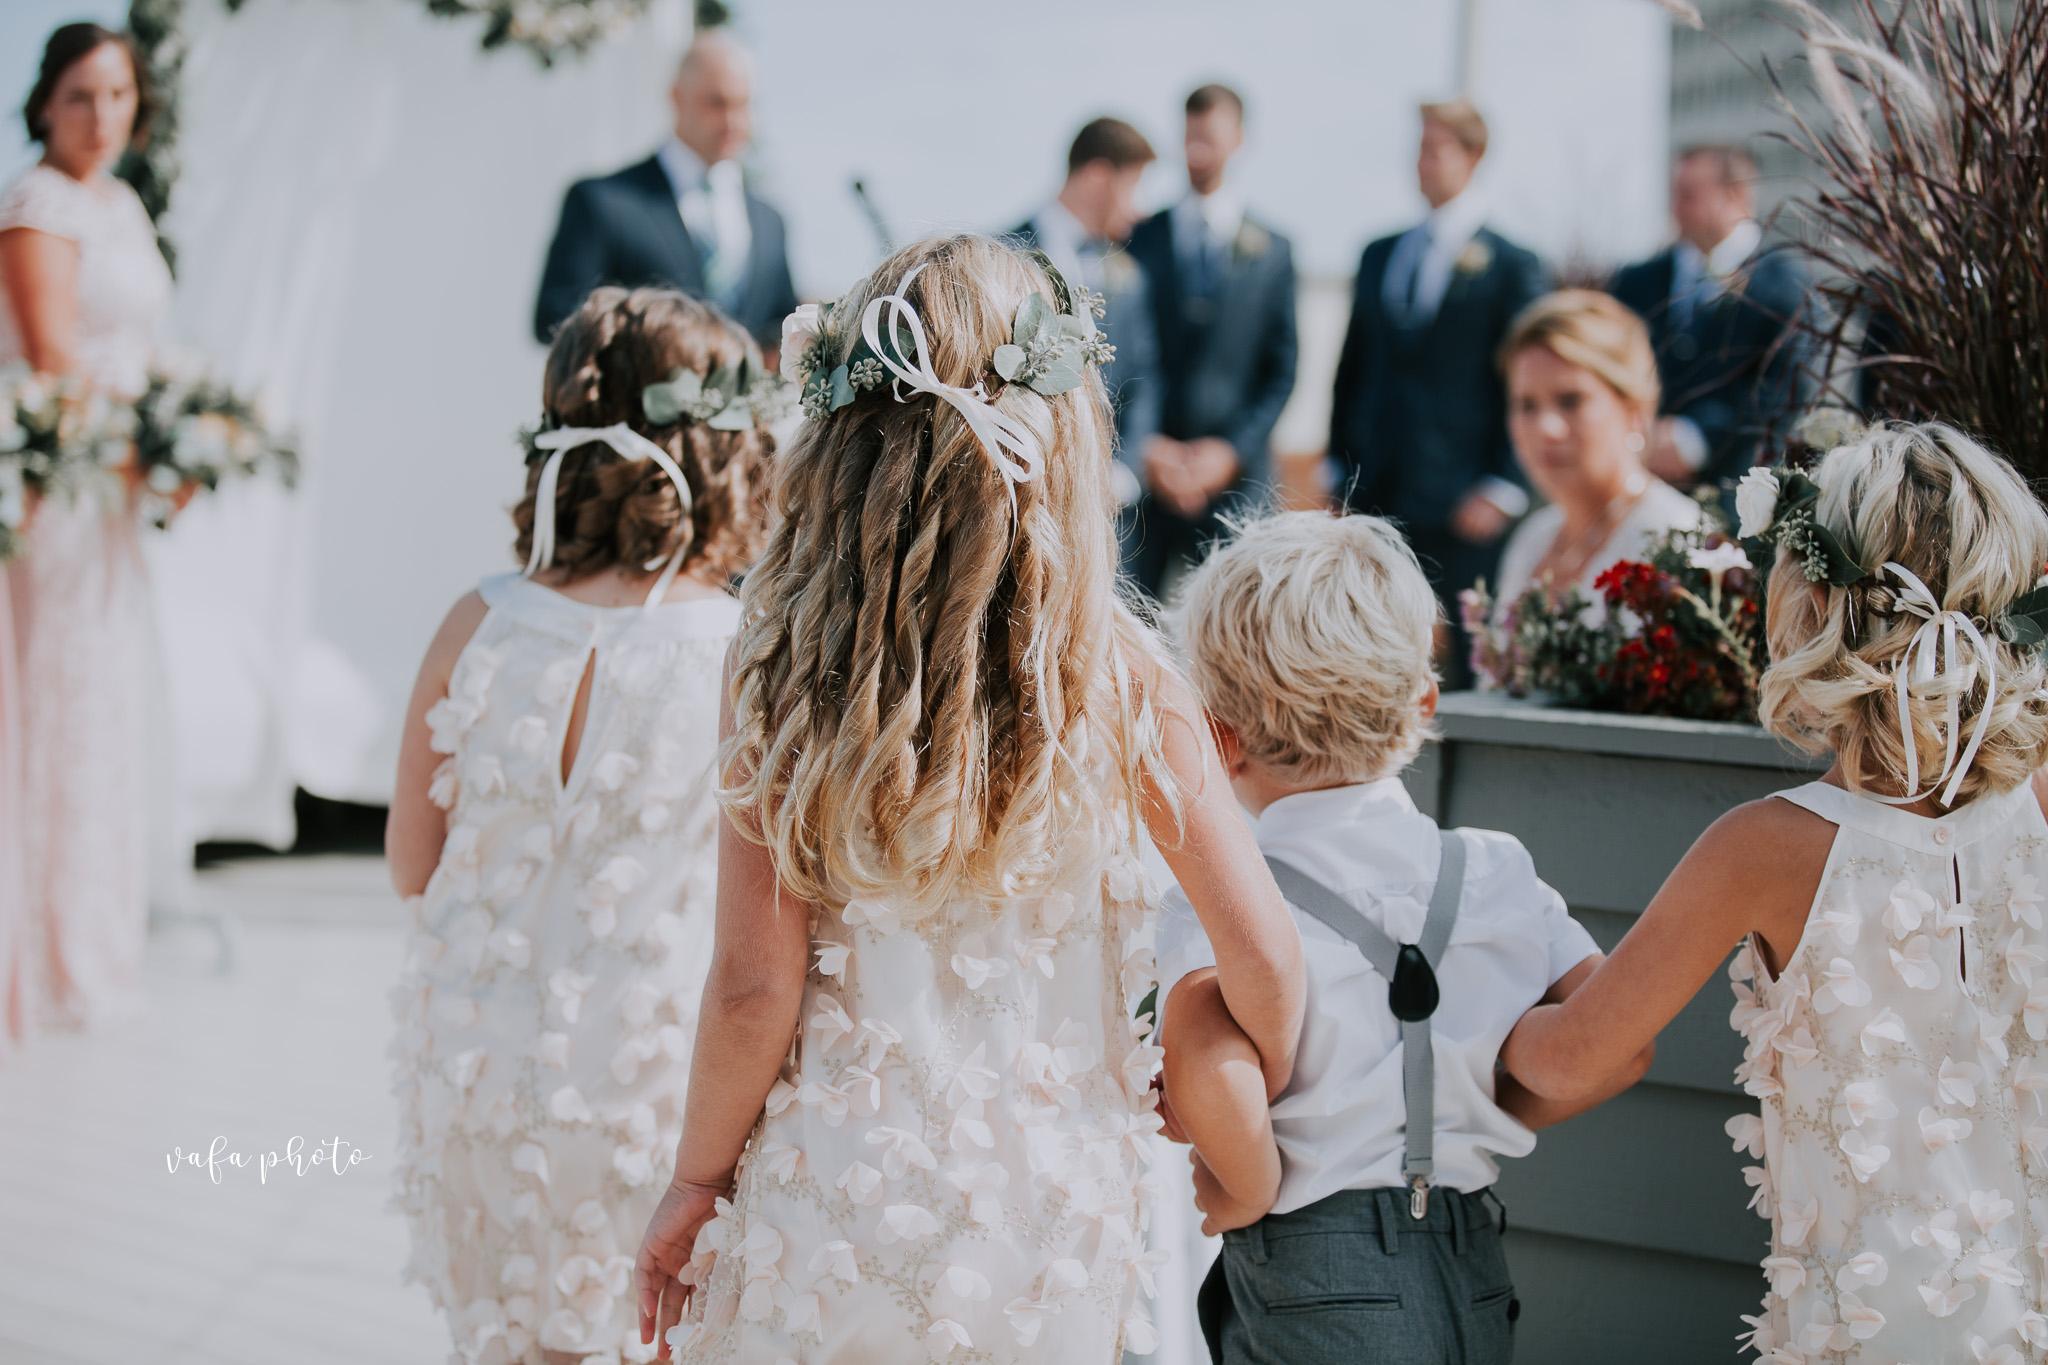 Milwaukee-Athletic-Club-Wedding-Amanda-Tony-Vafa-Photo-309.jpg